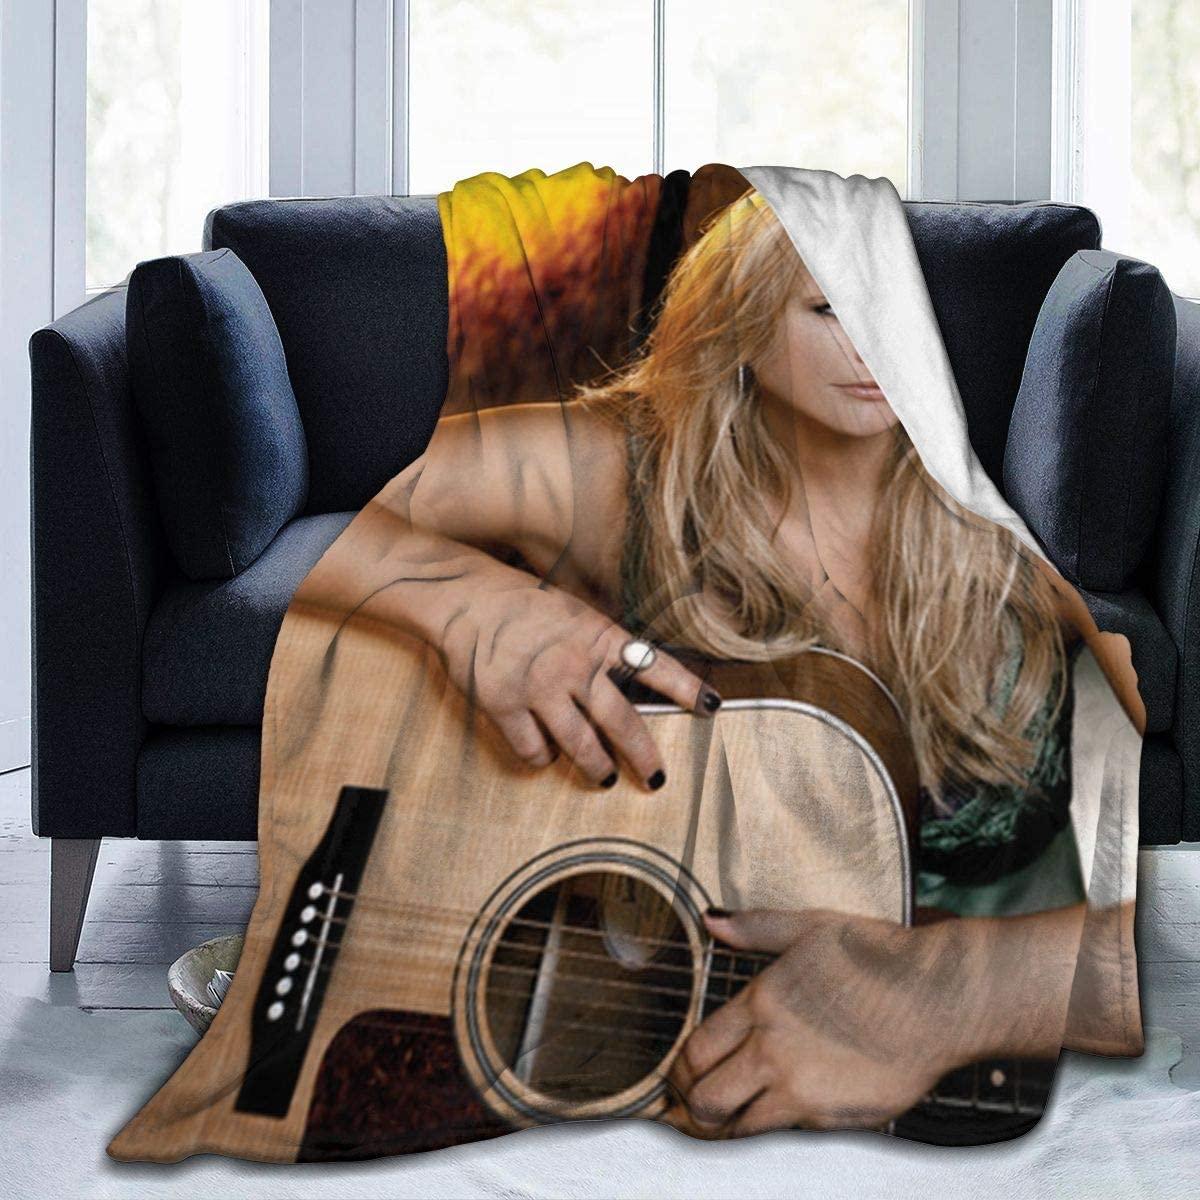 ThomasCGaona Miranda Lambert Queen Size Soft Micro Fleece Blanket,Super Warm,Luxury,Lightweight,Fuzzy,Fleece Blanket All Season for Couch,Sofa,Bed Blanket 50